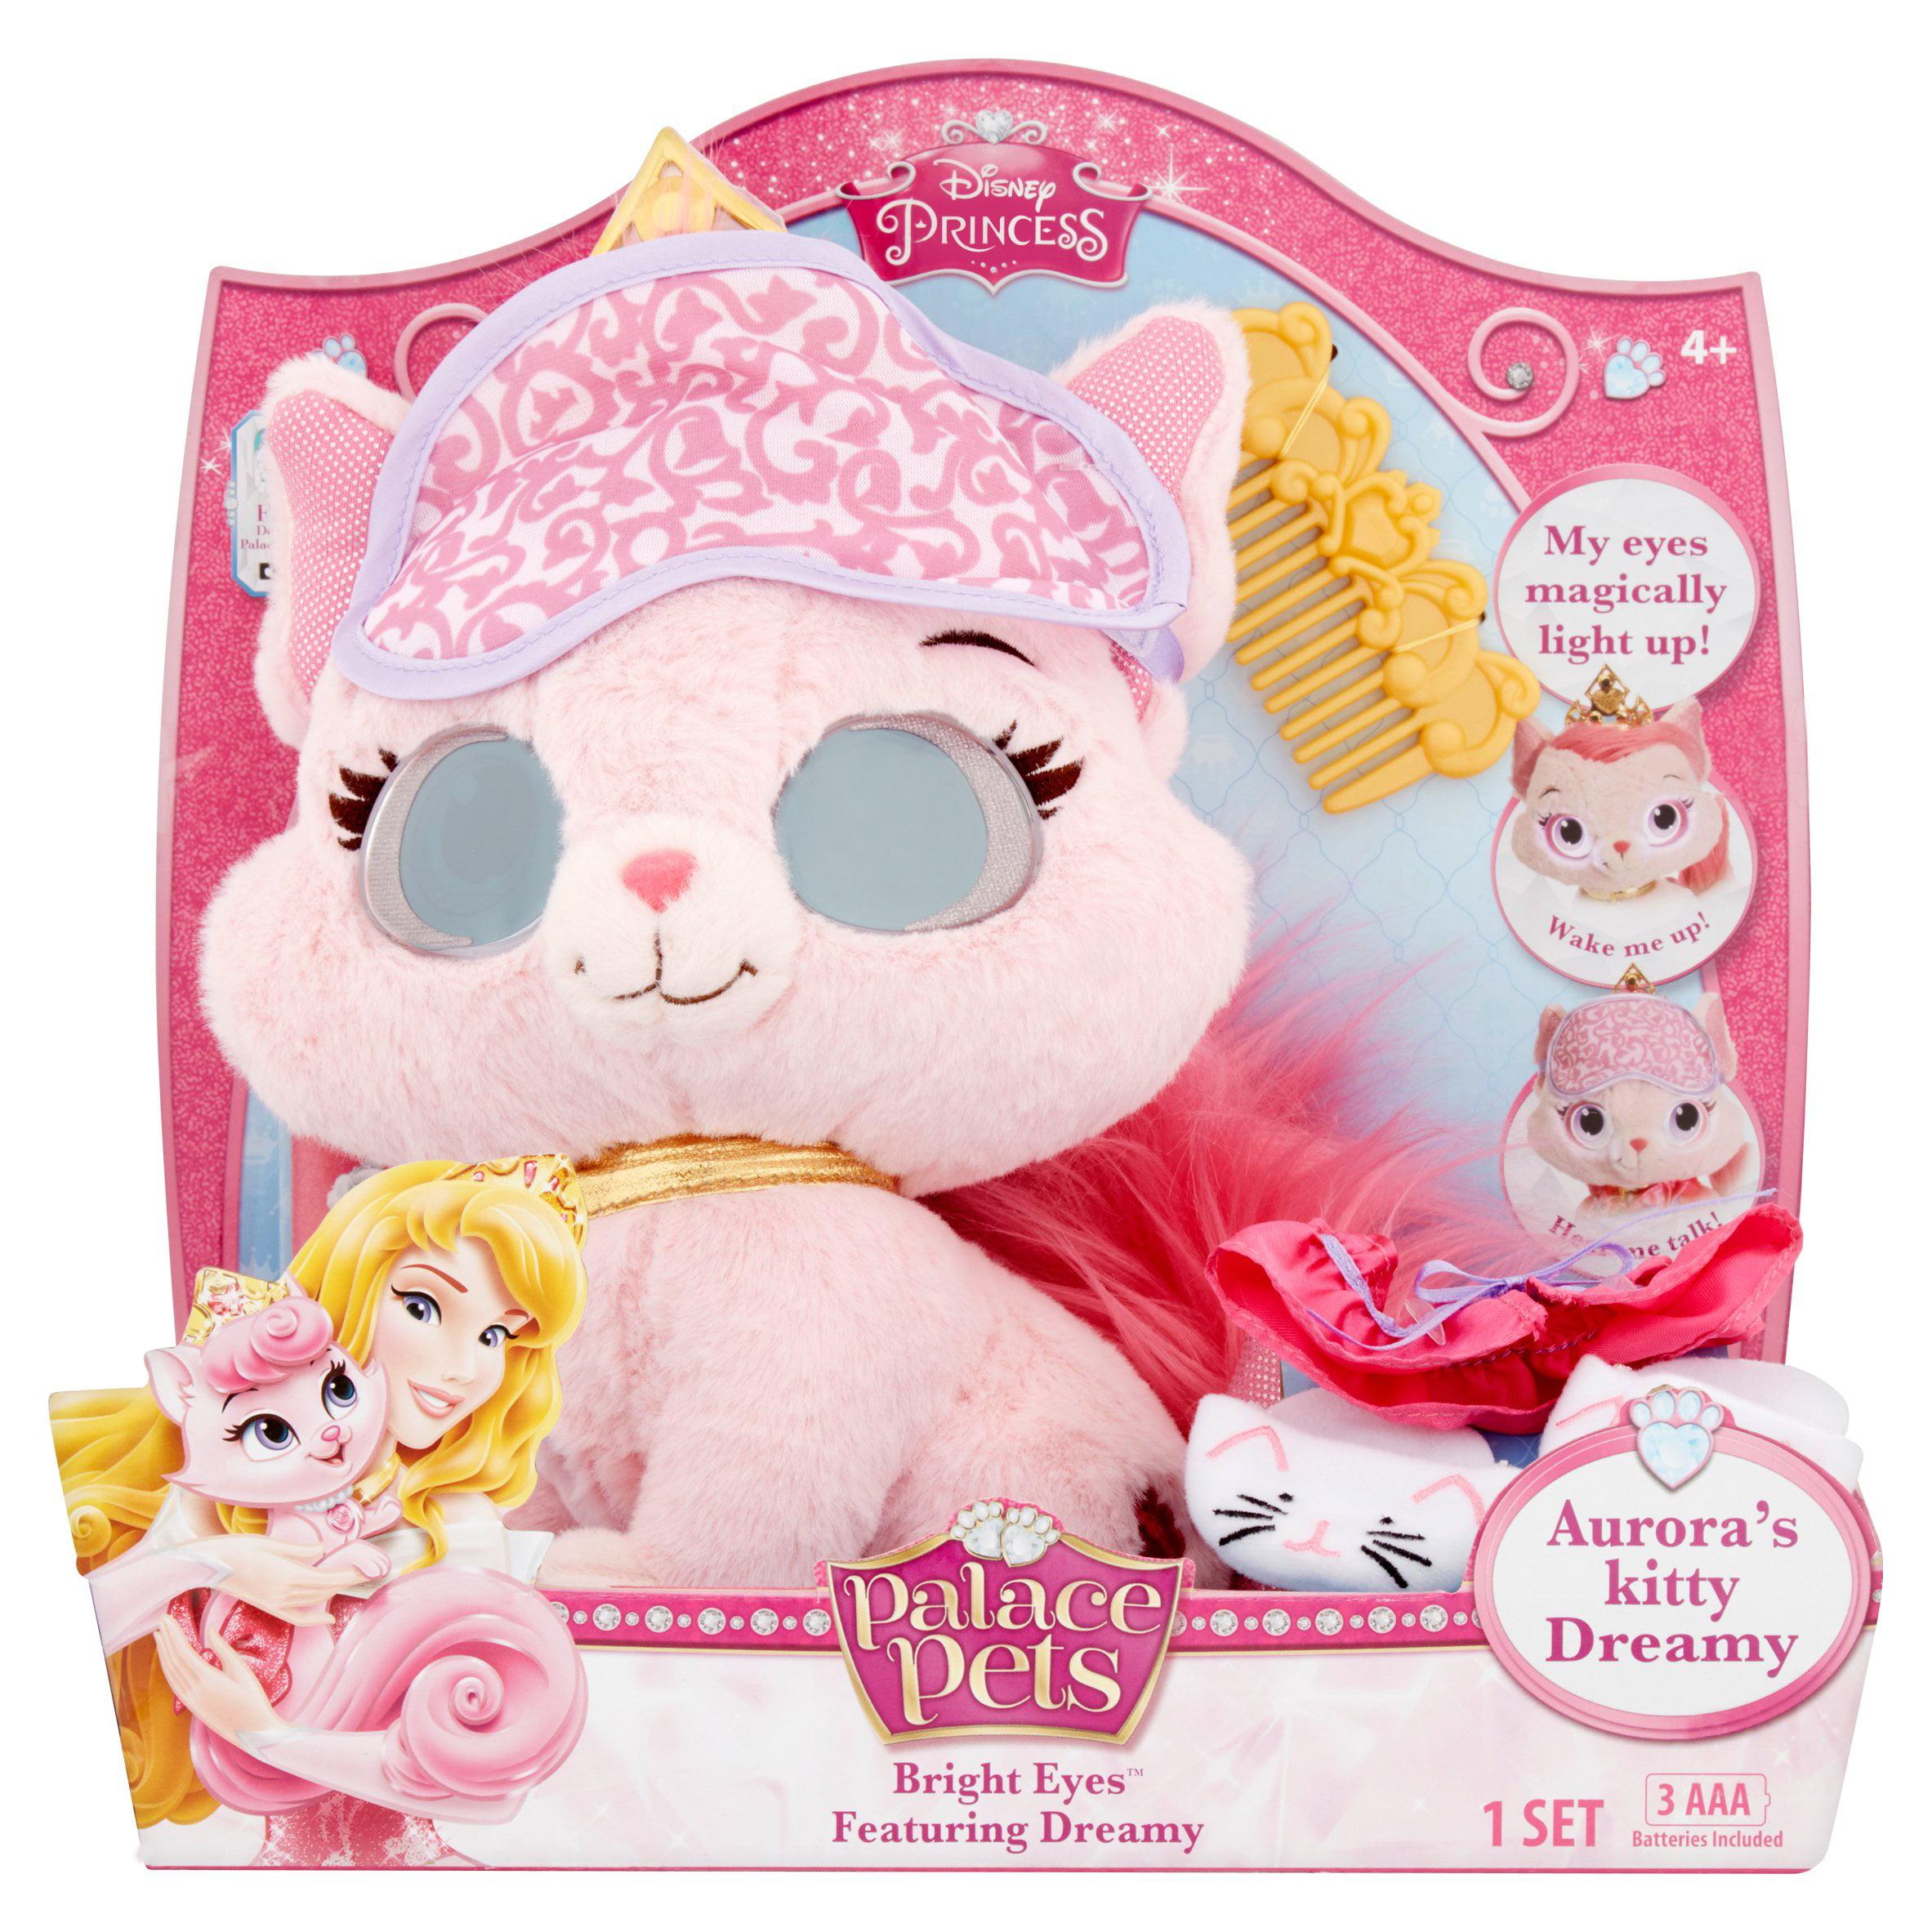 Disney Princess Palace Pets Bright Eyes Aurora's Kitty Dreamy Toy Set 4+ by BLIP LLC